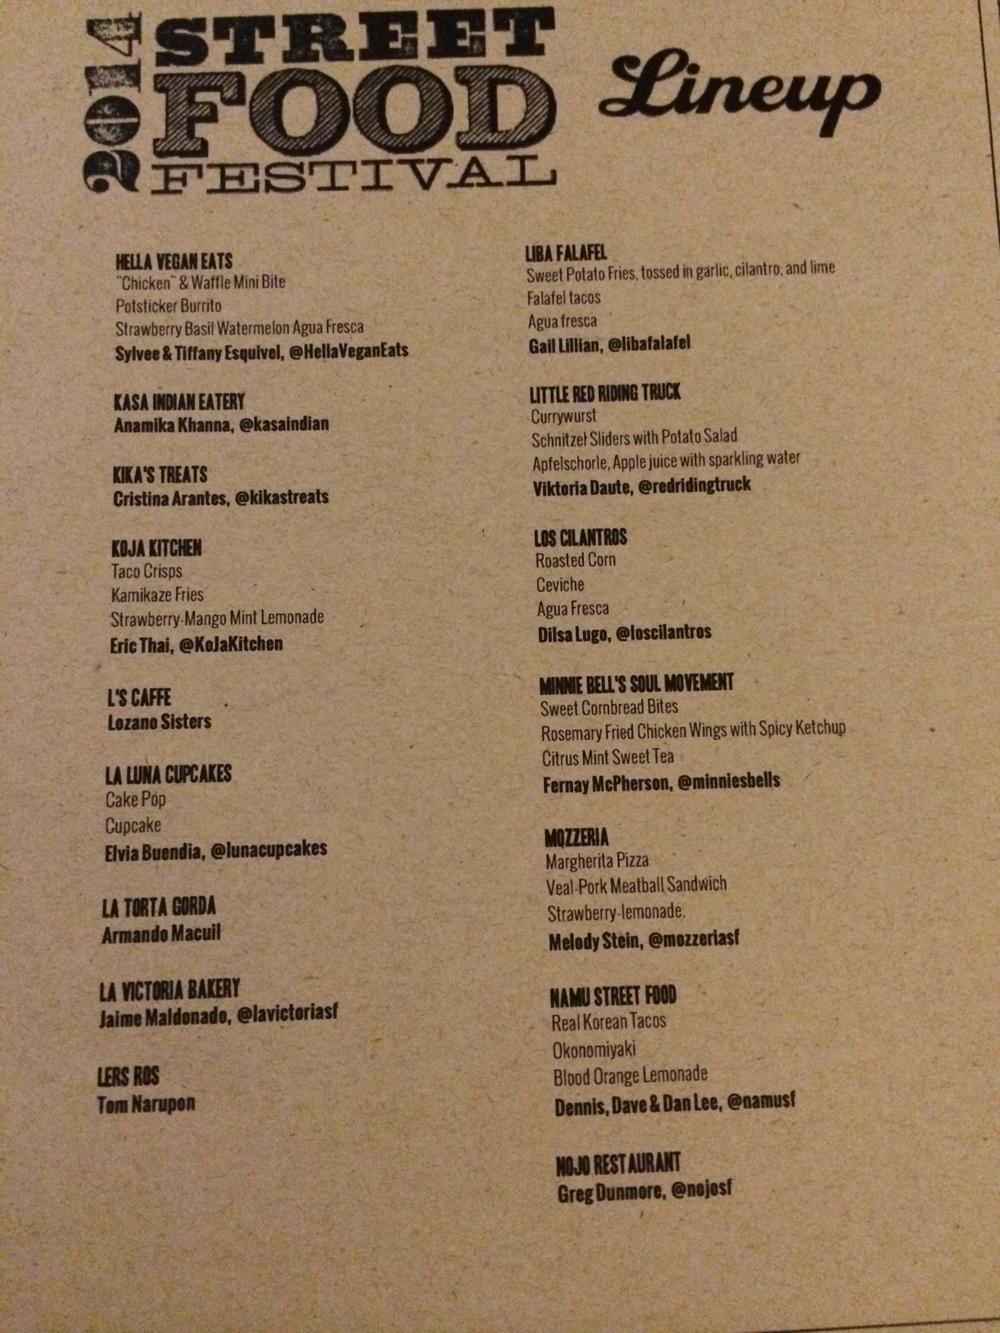 2014 SF Street Food Festival Menu - 5/5